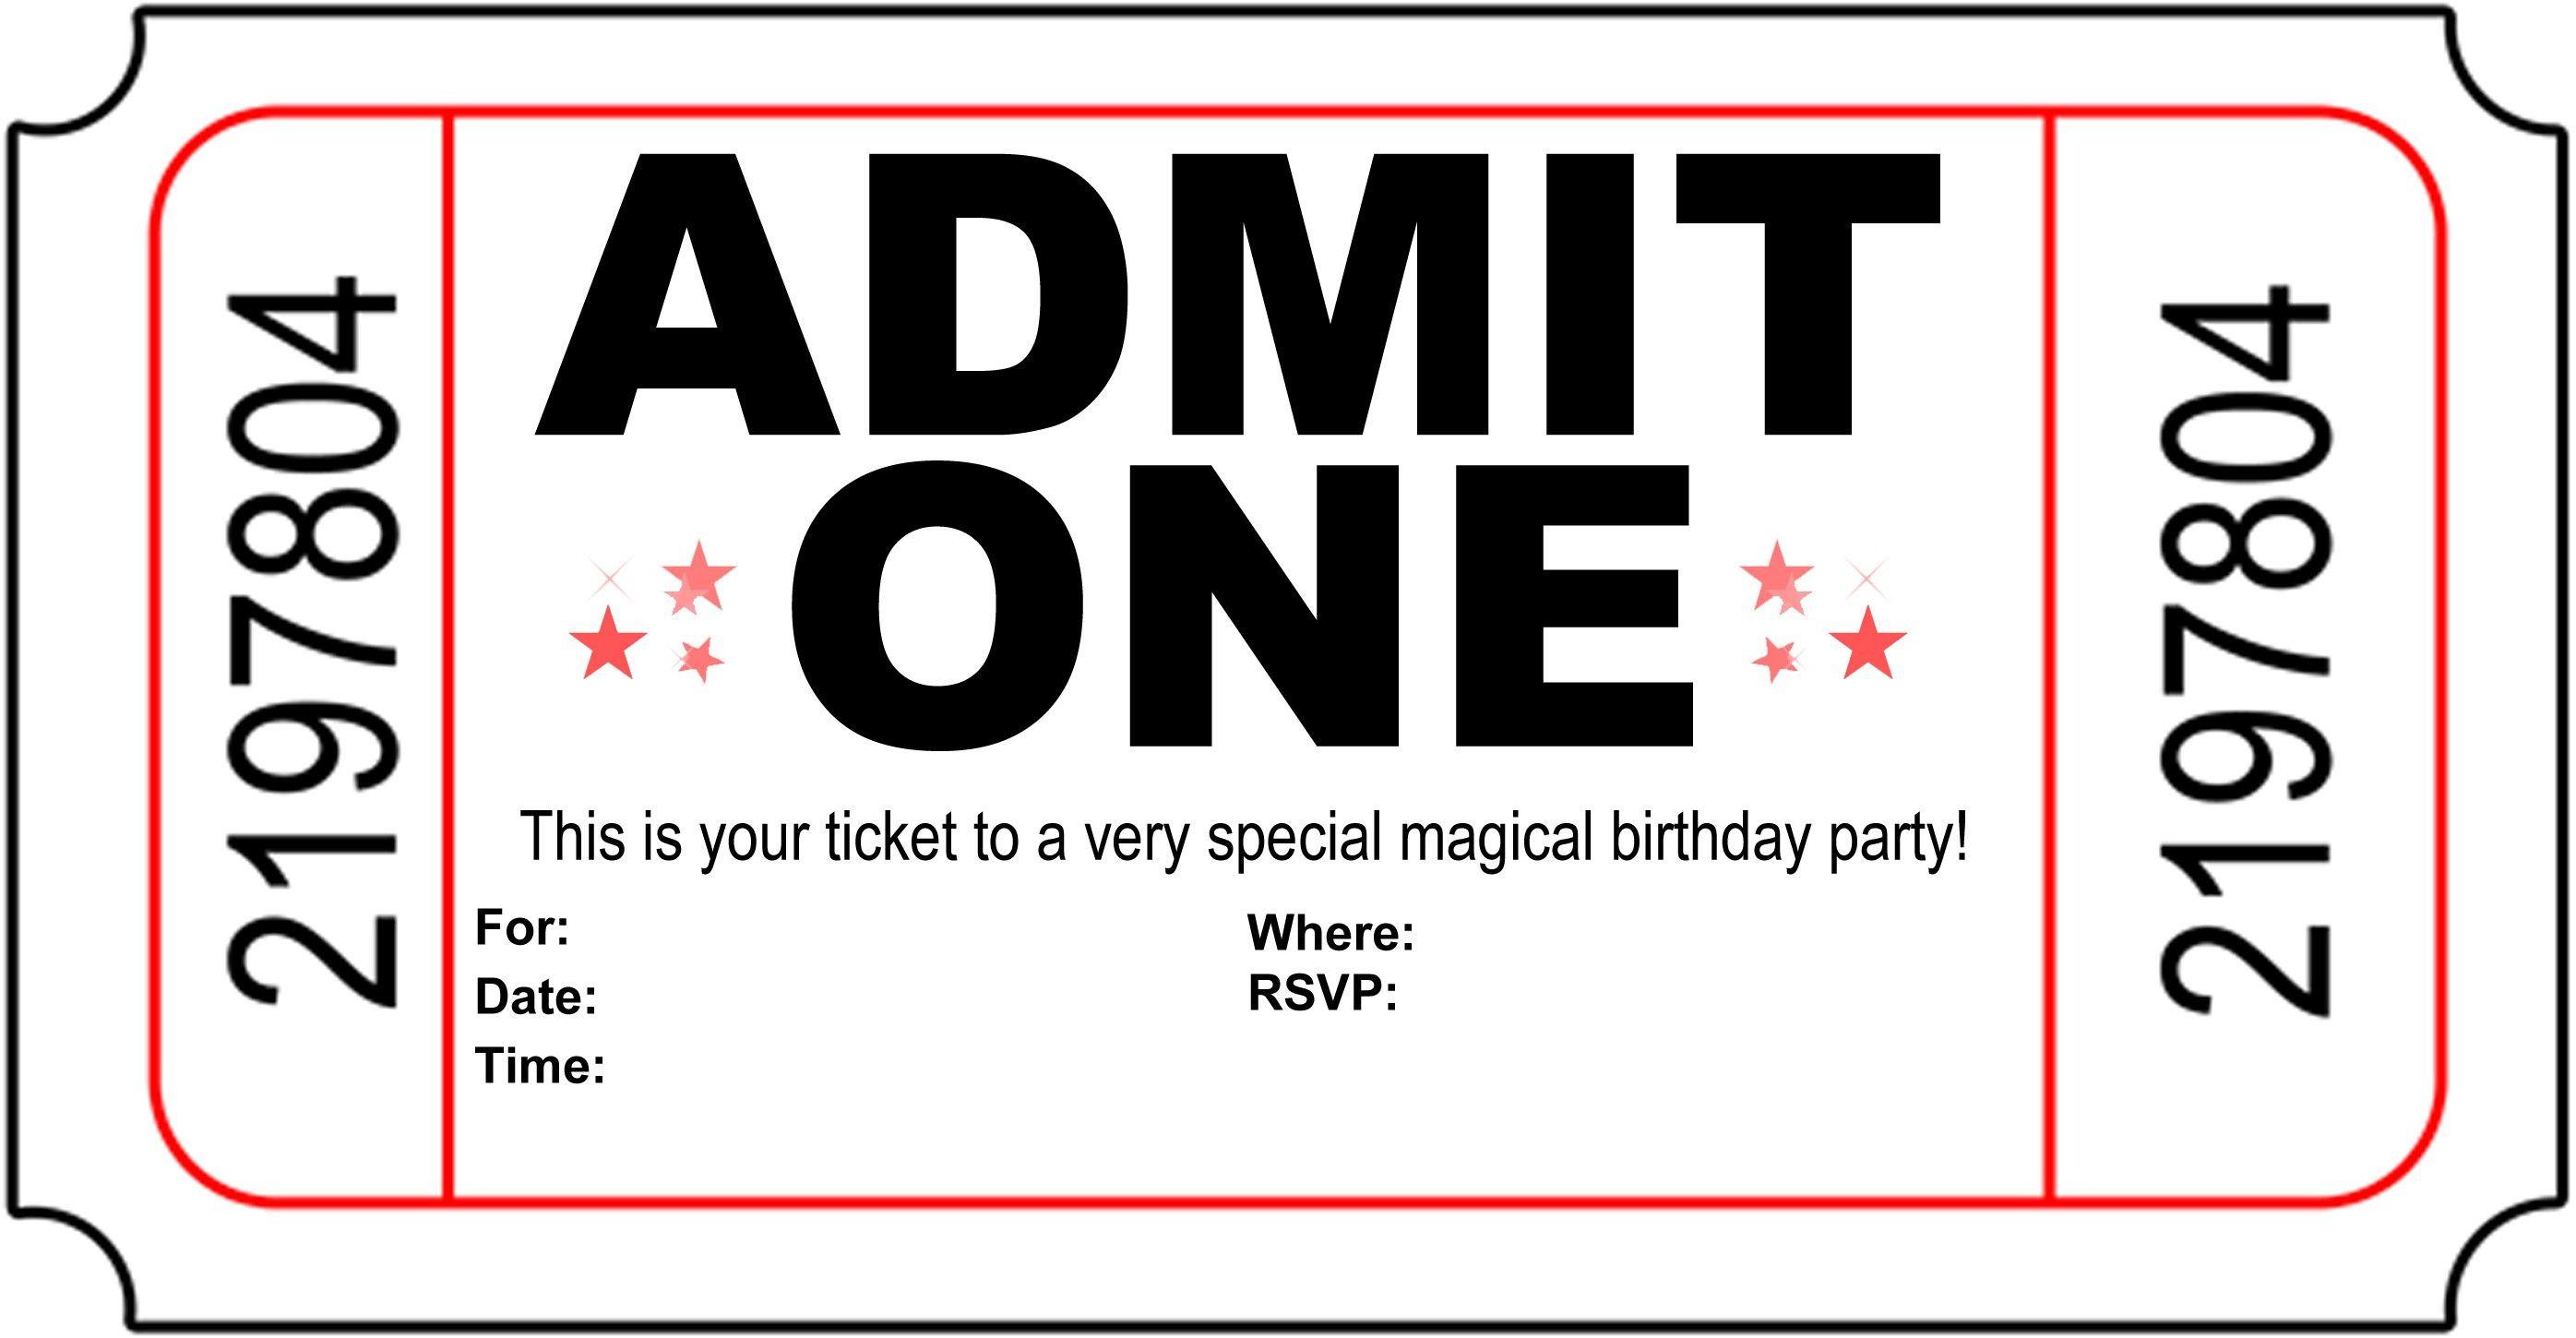 Free Printable Movie Tickets Template Polar Express Party Invitation - Free Printable Movie Tickets